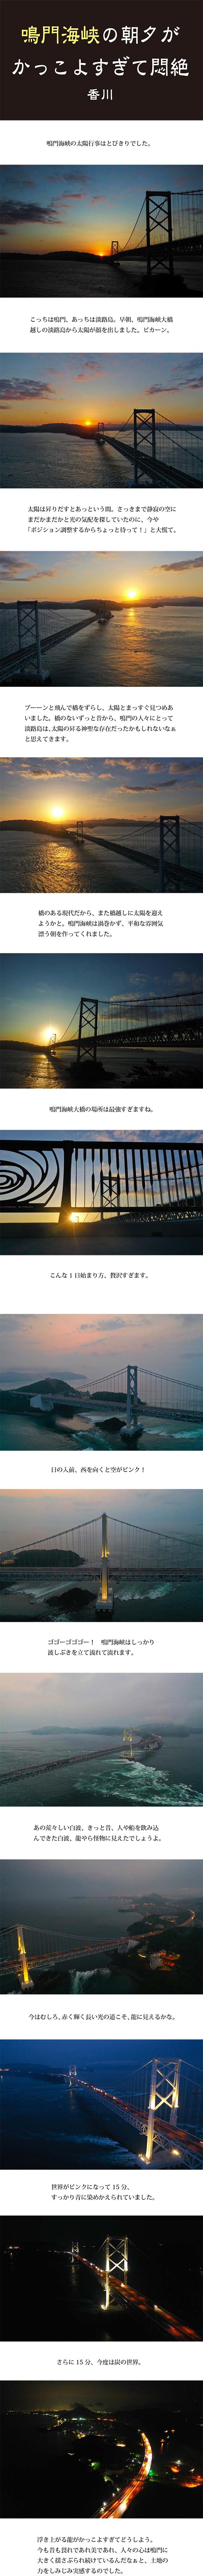 tomako190724.jpg